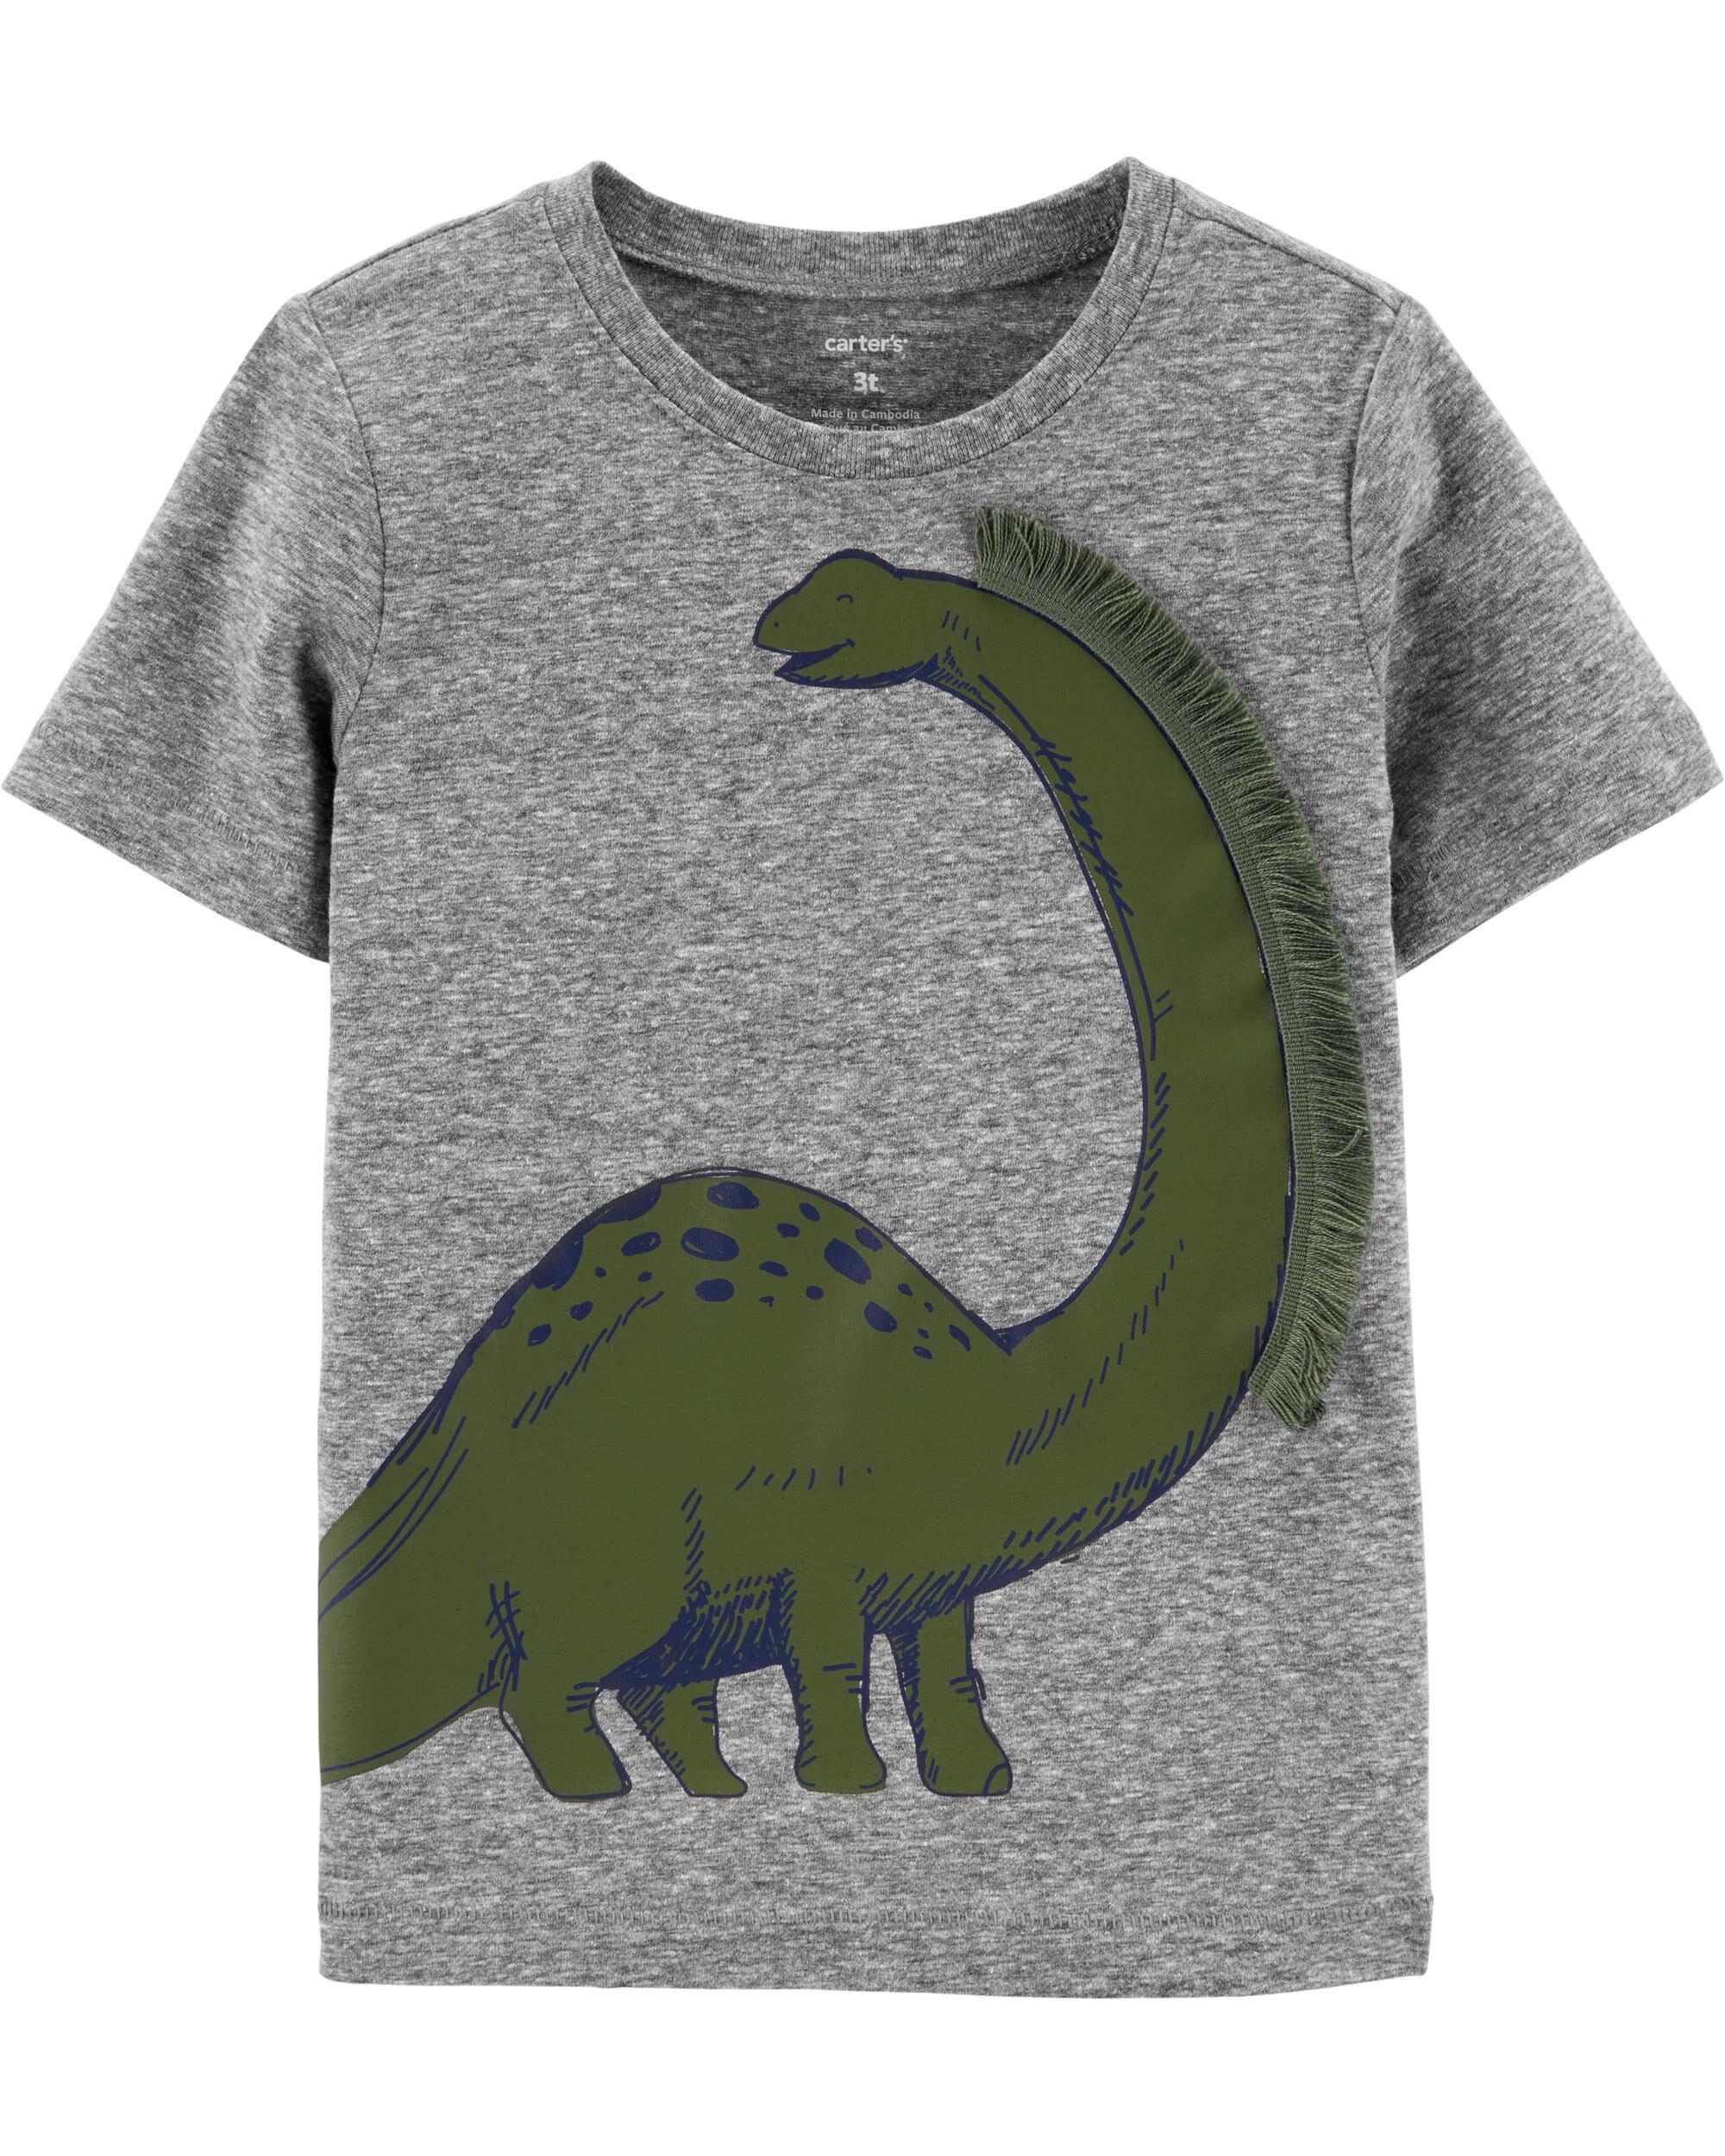 *Clearance*  Dinosaur Snow Yarn Jersey Tee